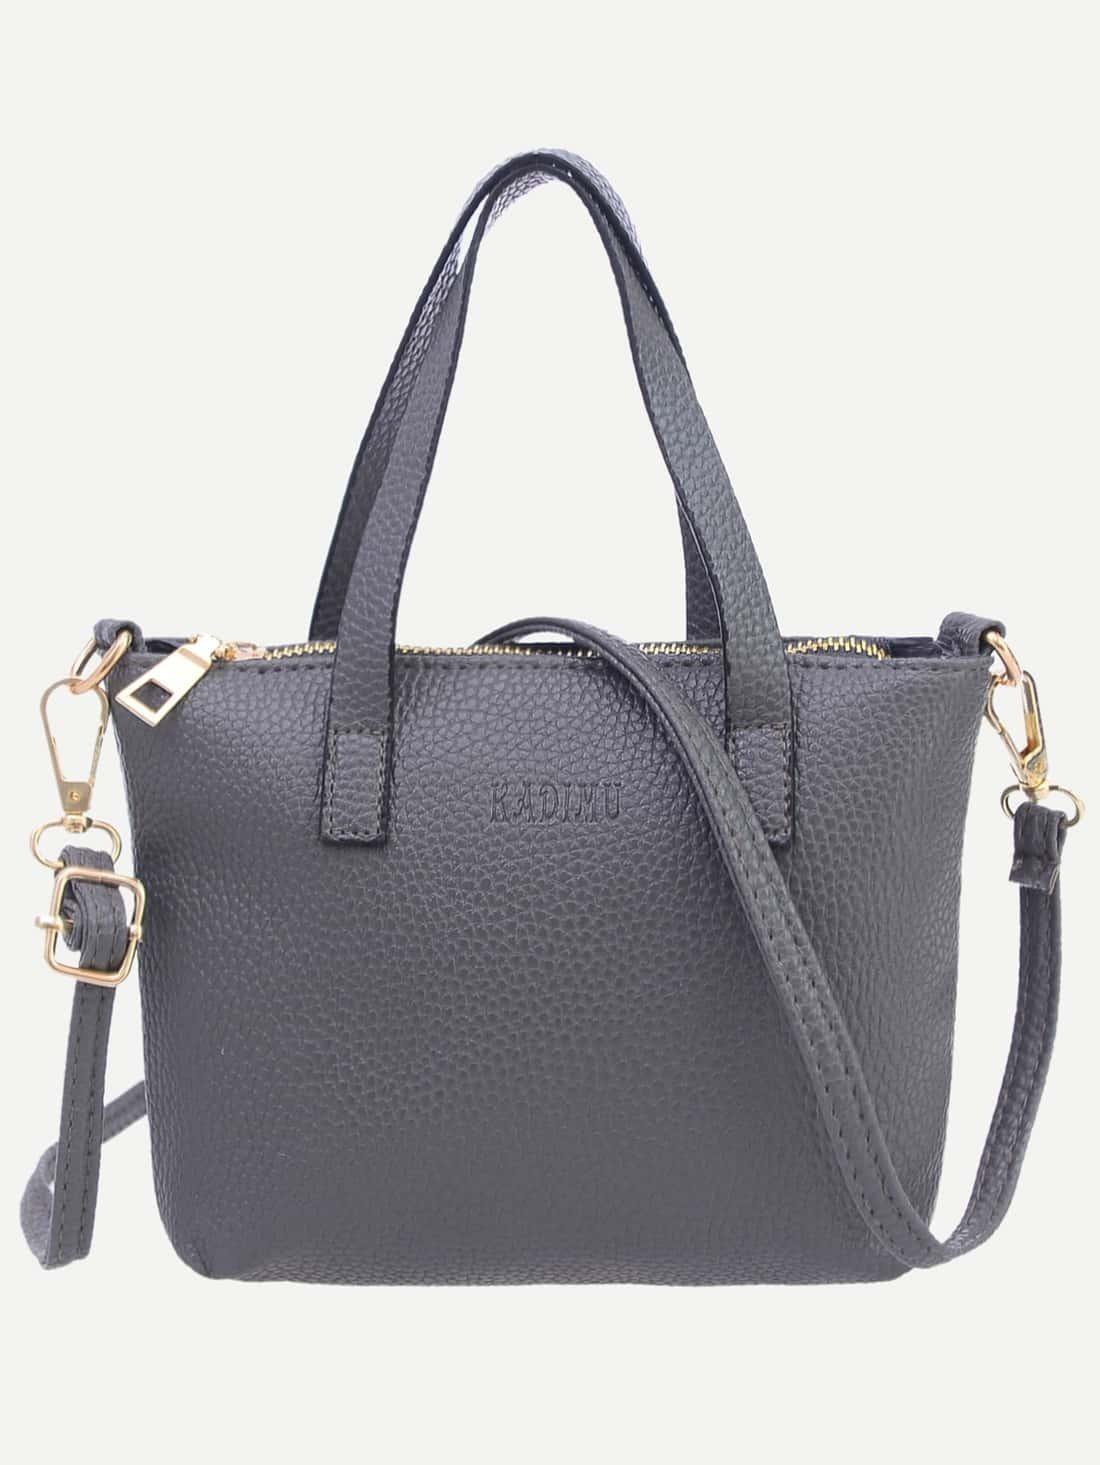 e81d85566b Tote Bag With Strap